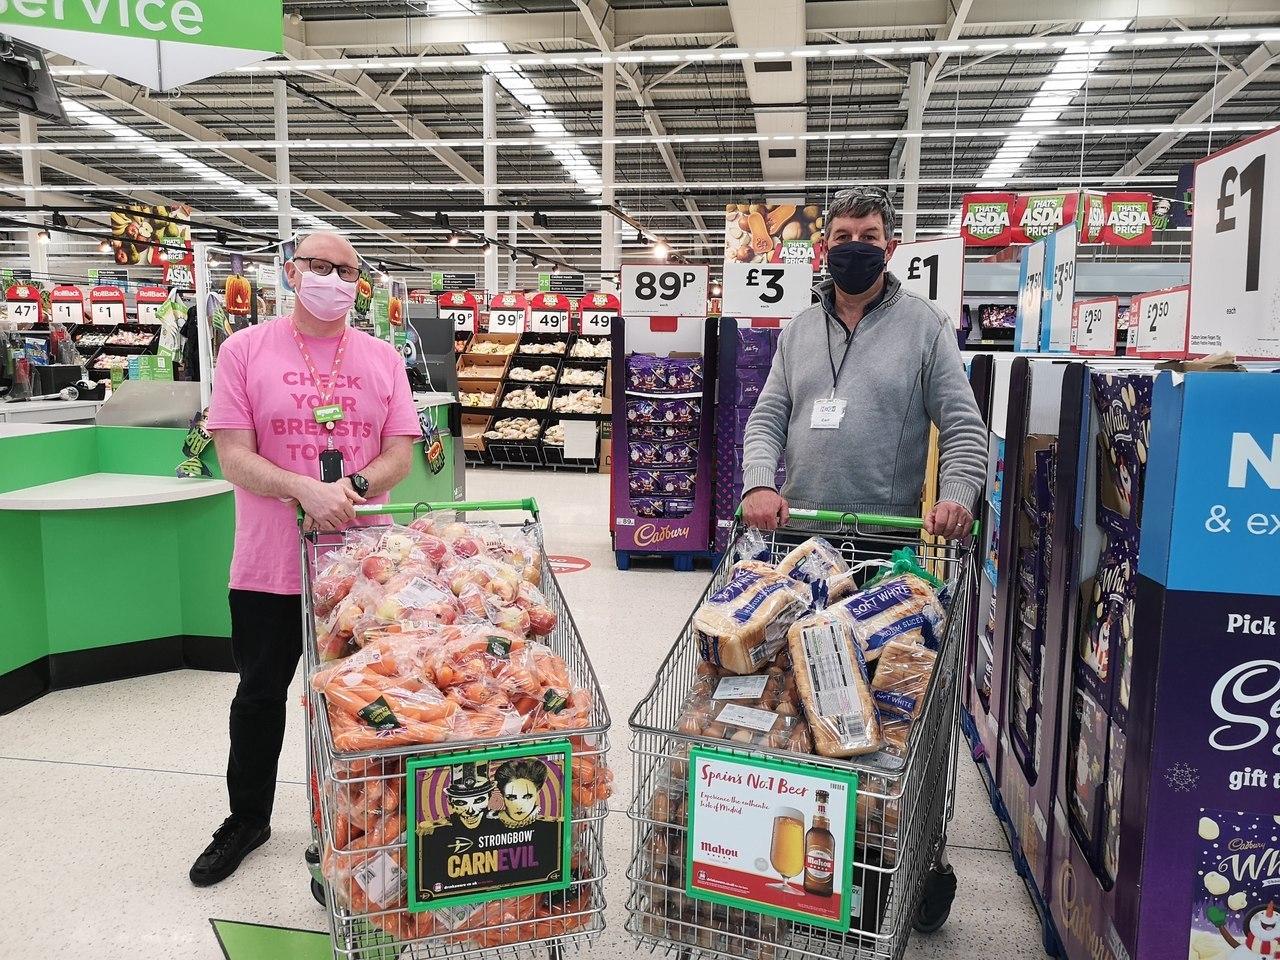 Helping fight holiday hunger | Asda Long Eaton